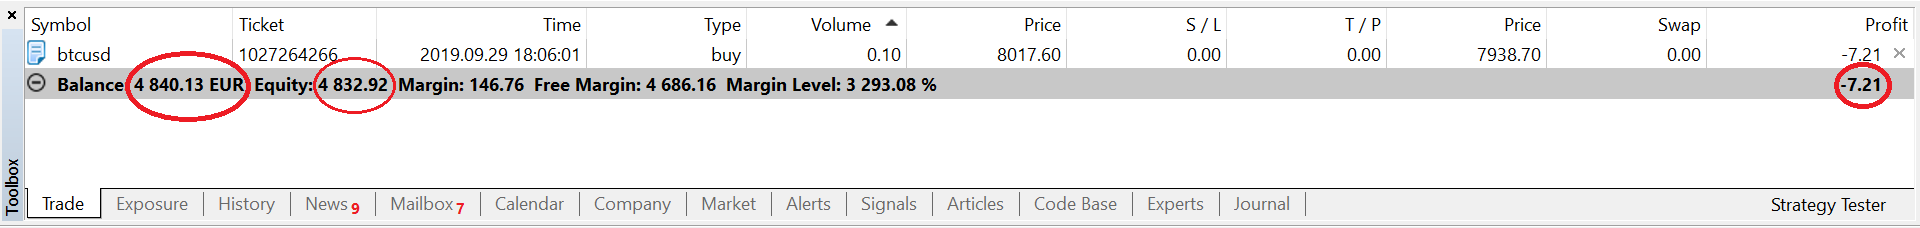 atveriet demo kontu akciju tirgū